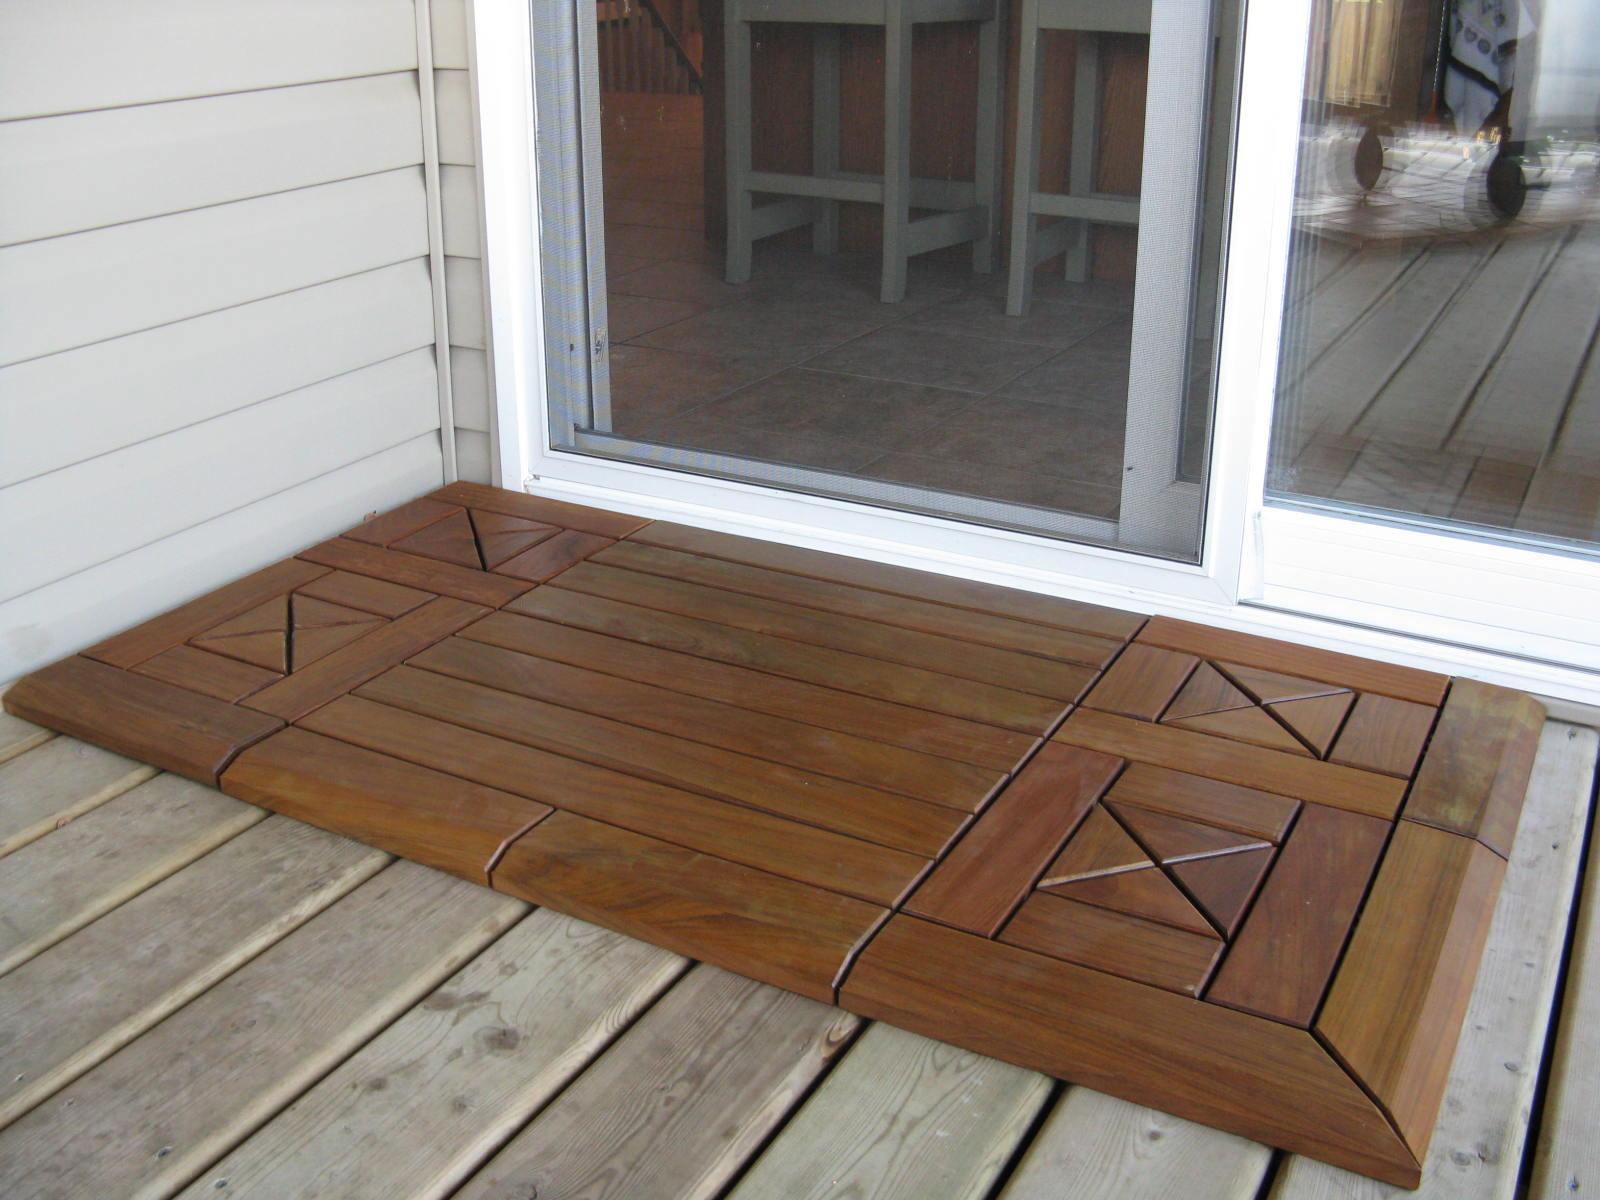 New Interlocking Deck Tiles — Rickyhil Outdoor Ideas